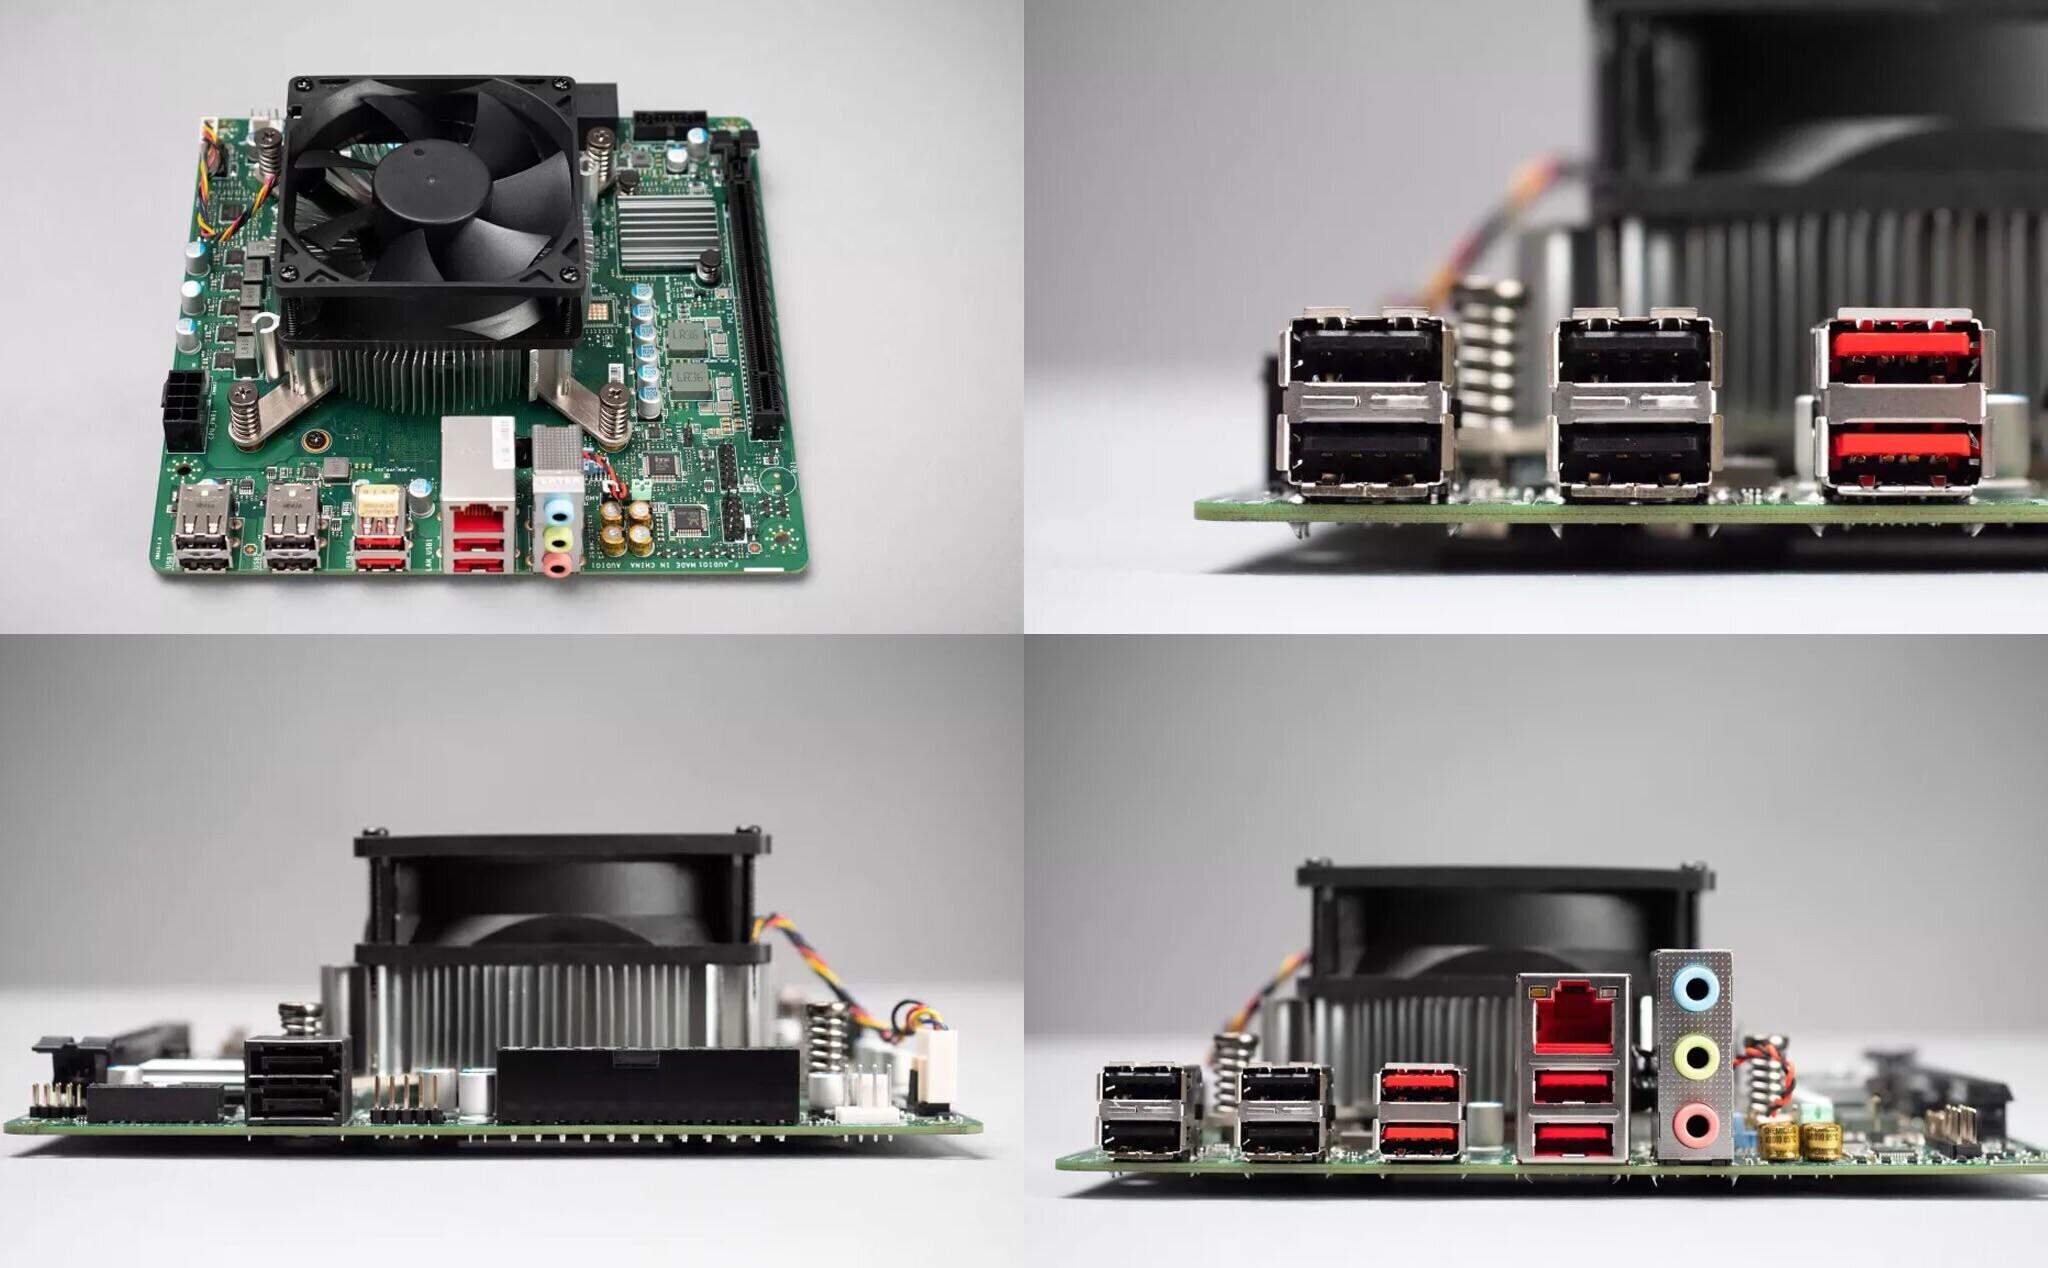 Выпущен компьютер на комплектующих ранней версии консоли Xbox Series X